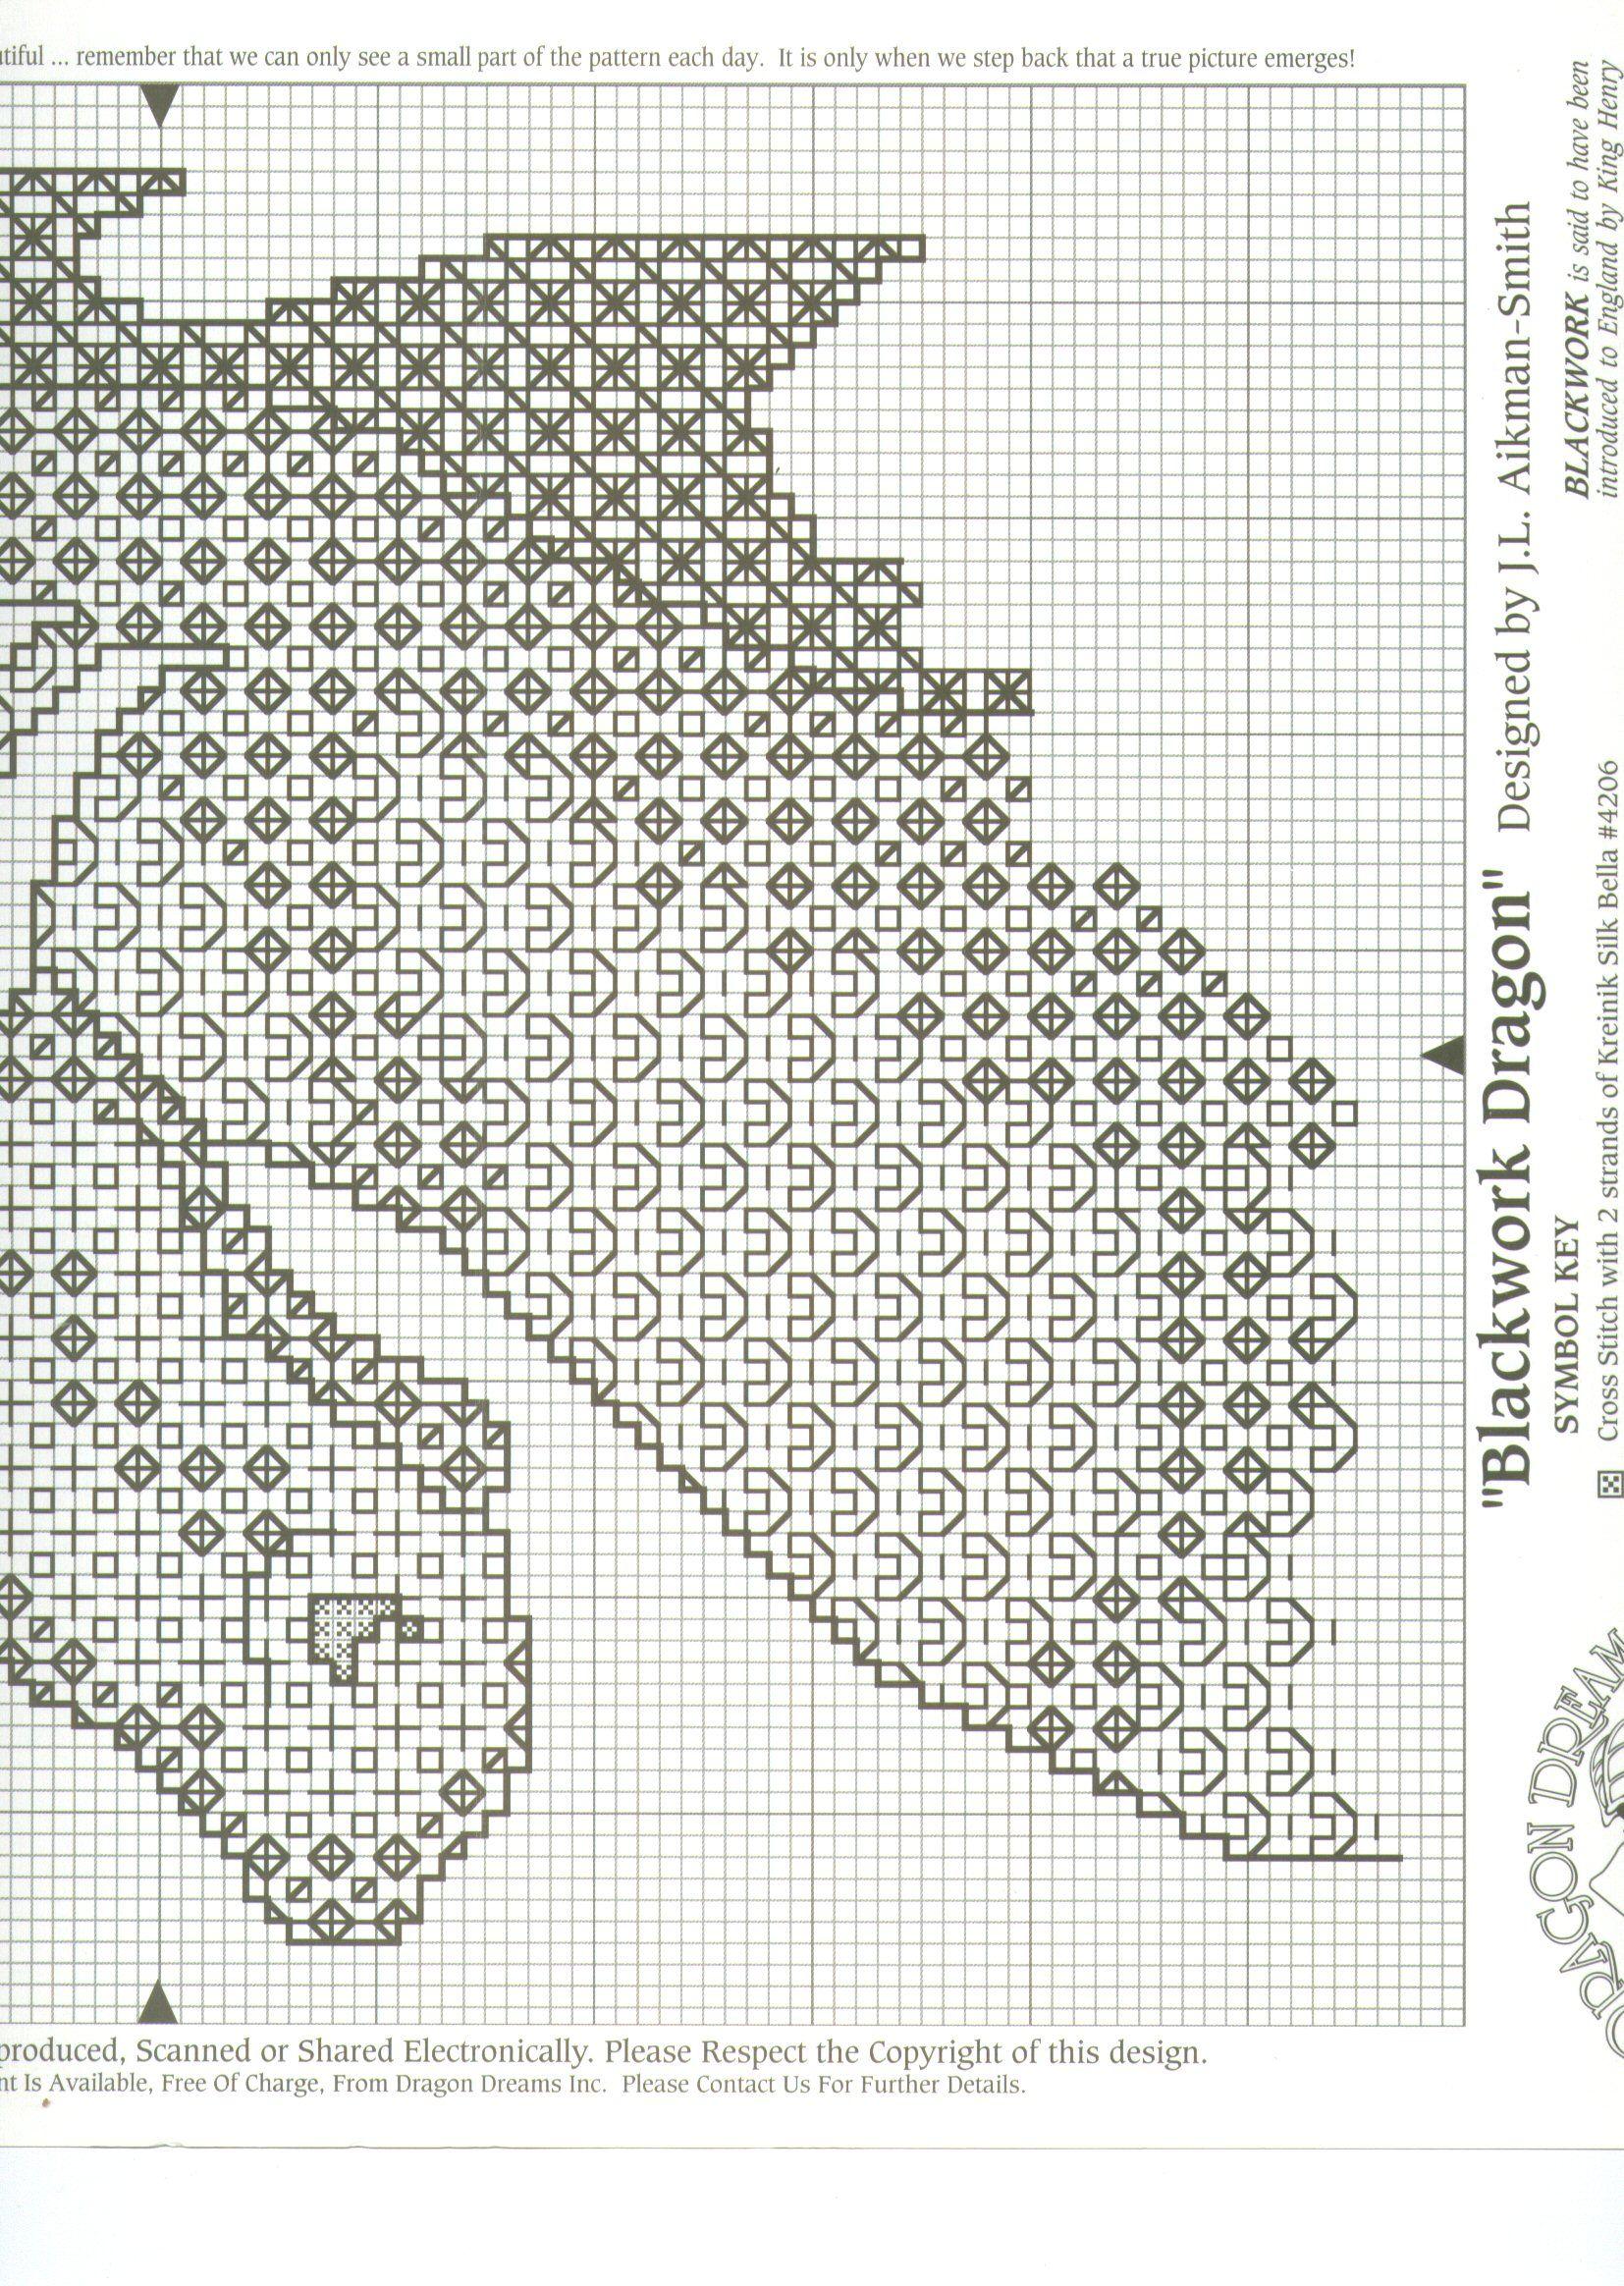 A Blackwork Fantasy Dragon Cross Stitch Chart